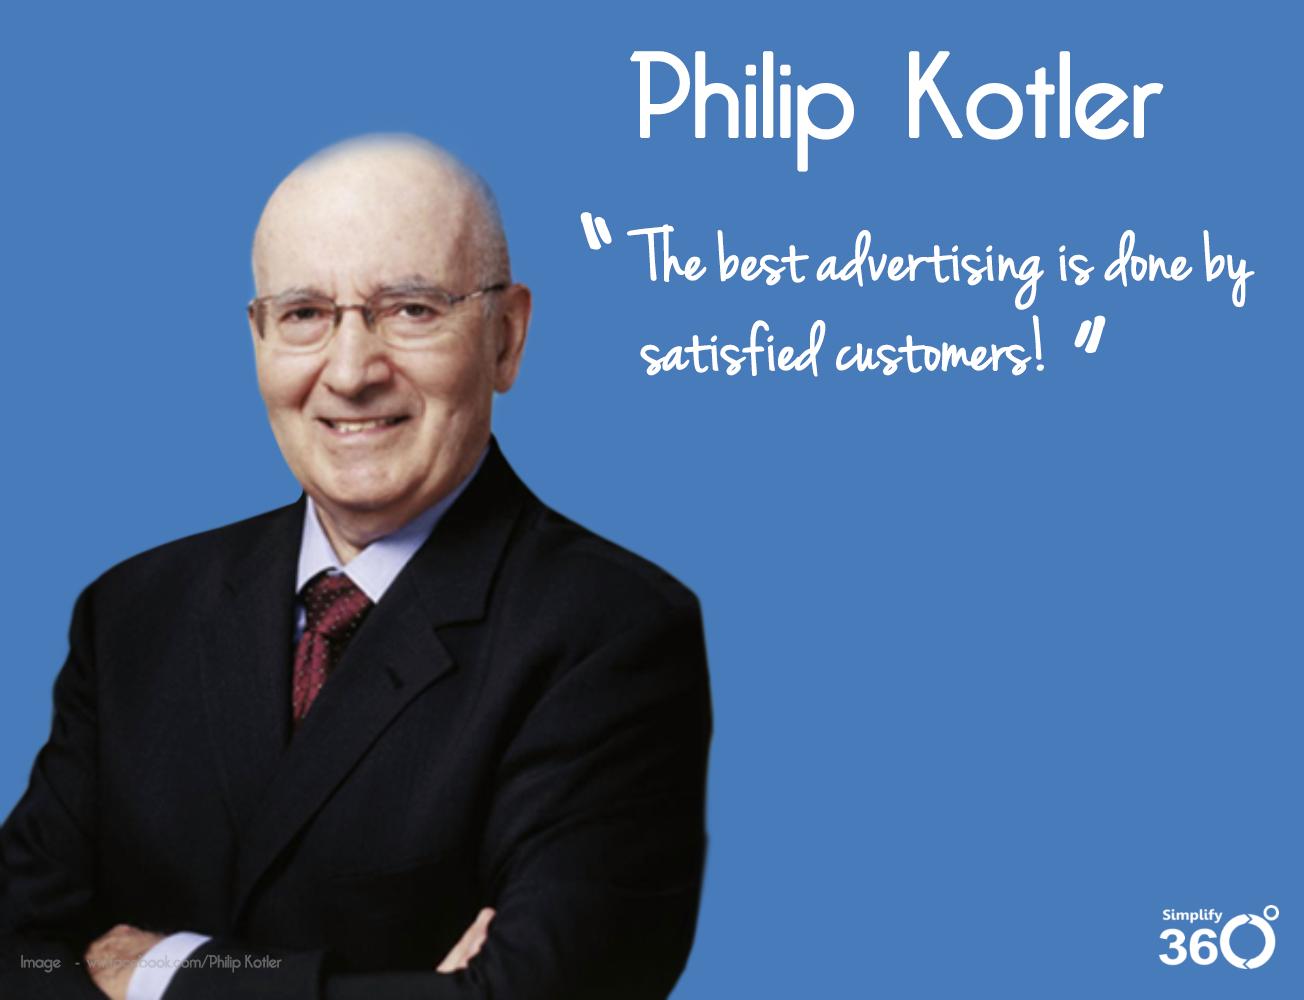 phiilp kotler's quote